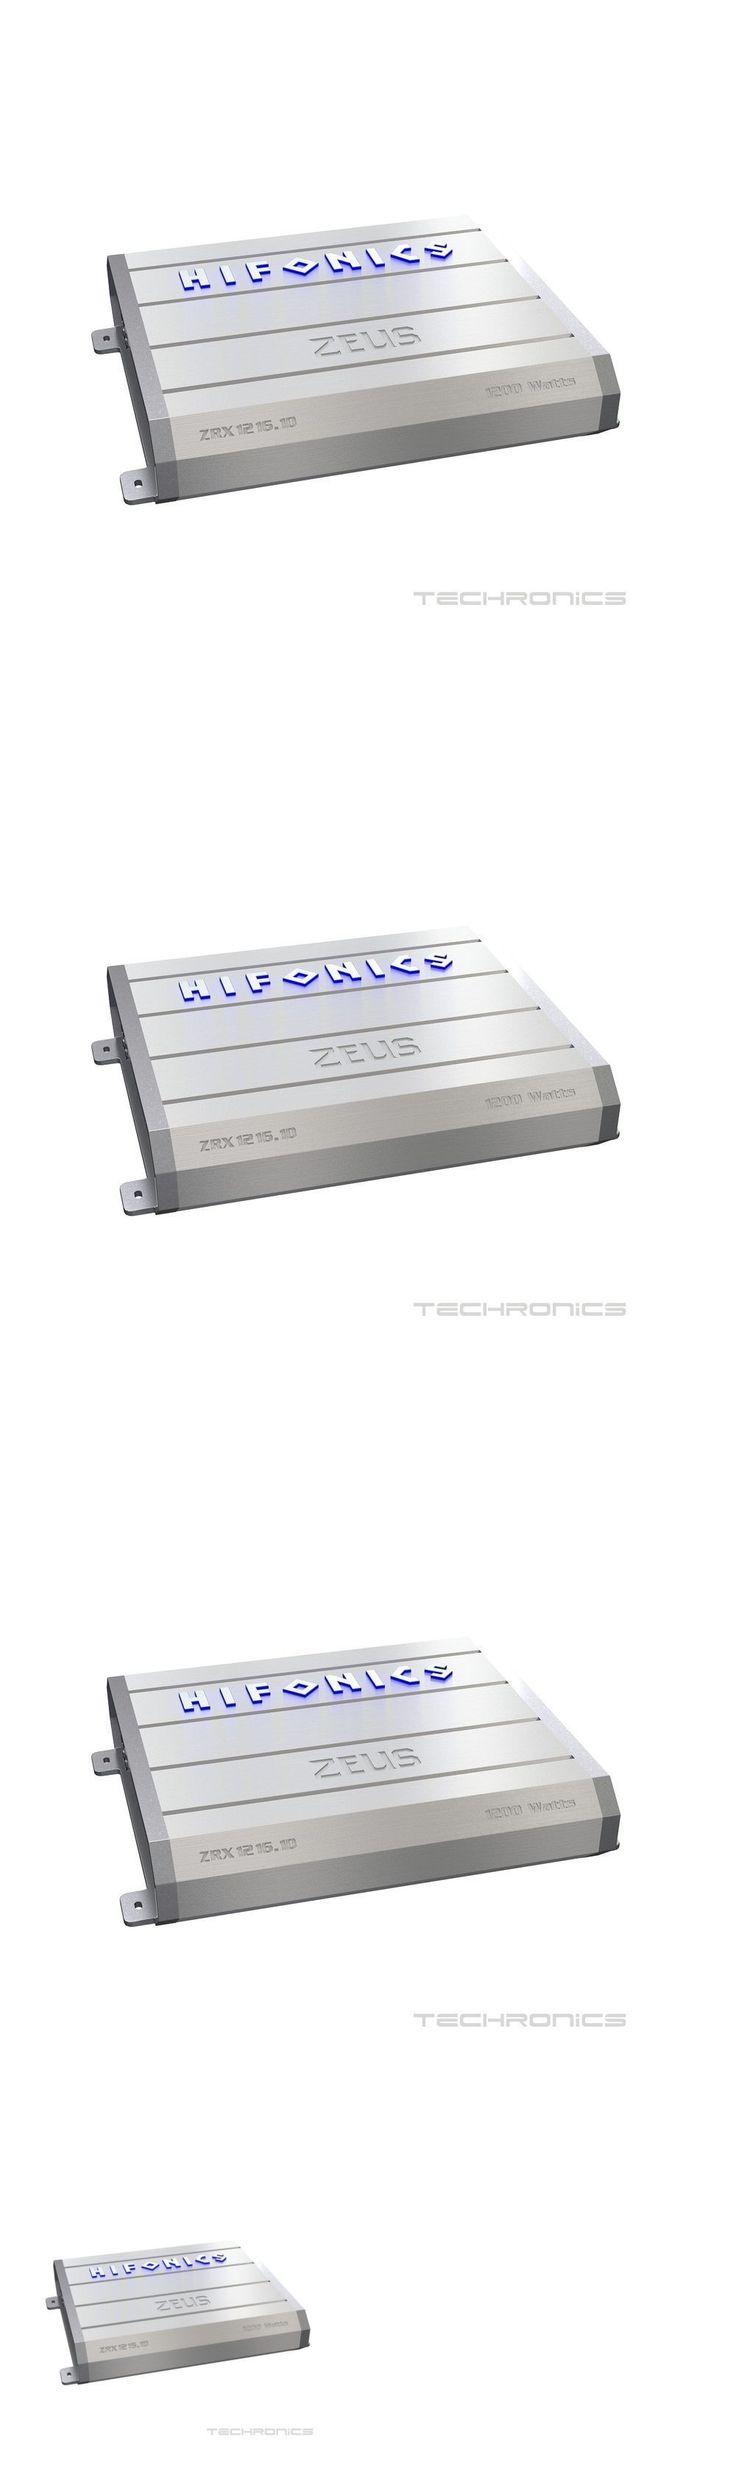 Car Amplifiers: Hifonics Zrx1216.1D 1200W Monoblock 1 Channel Zeus Class D Car Audio Amplifier -> BUY IT NOW ONLY: $129.95 on eBay!